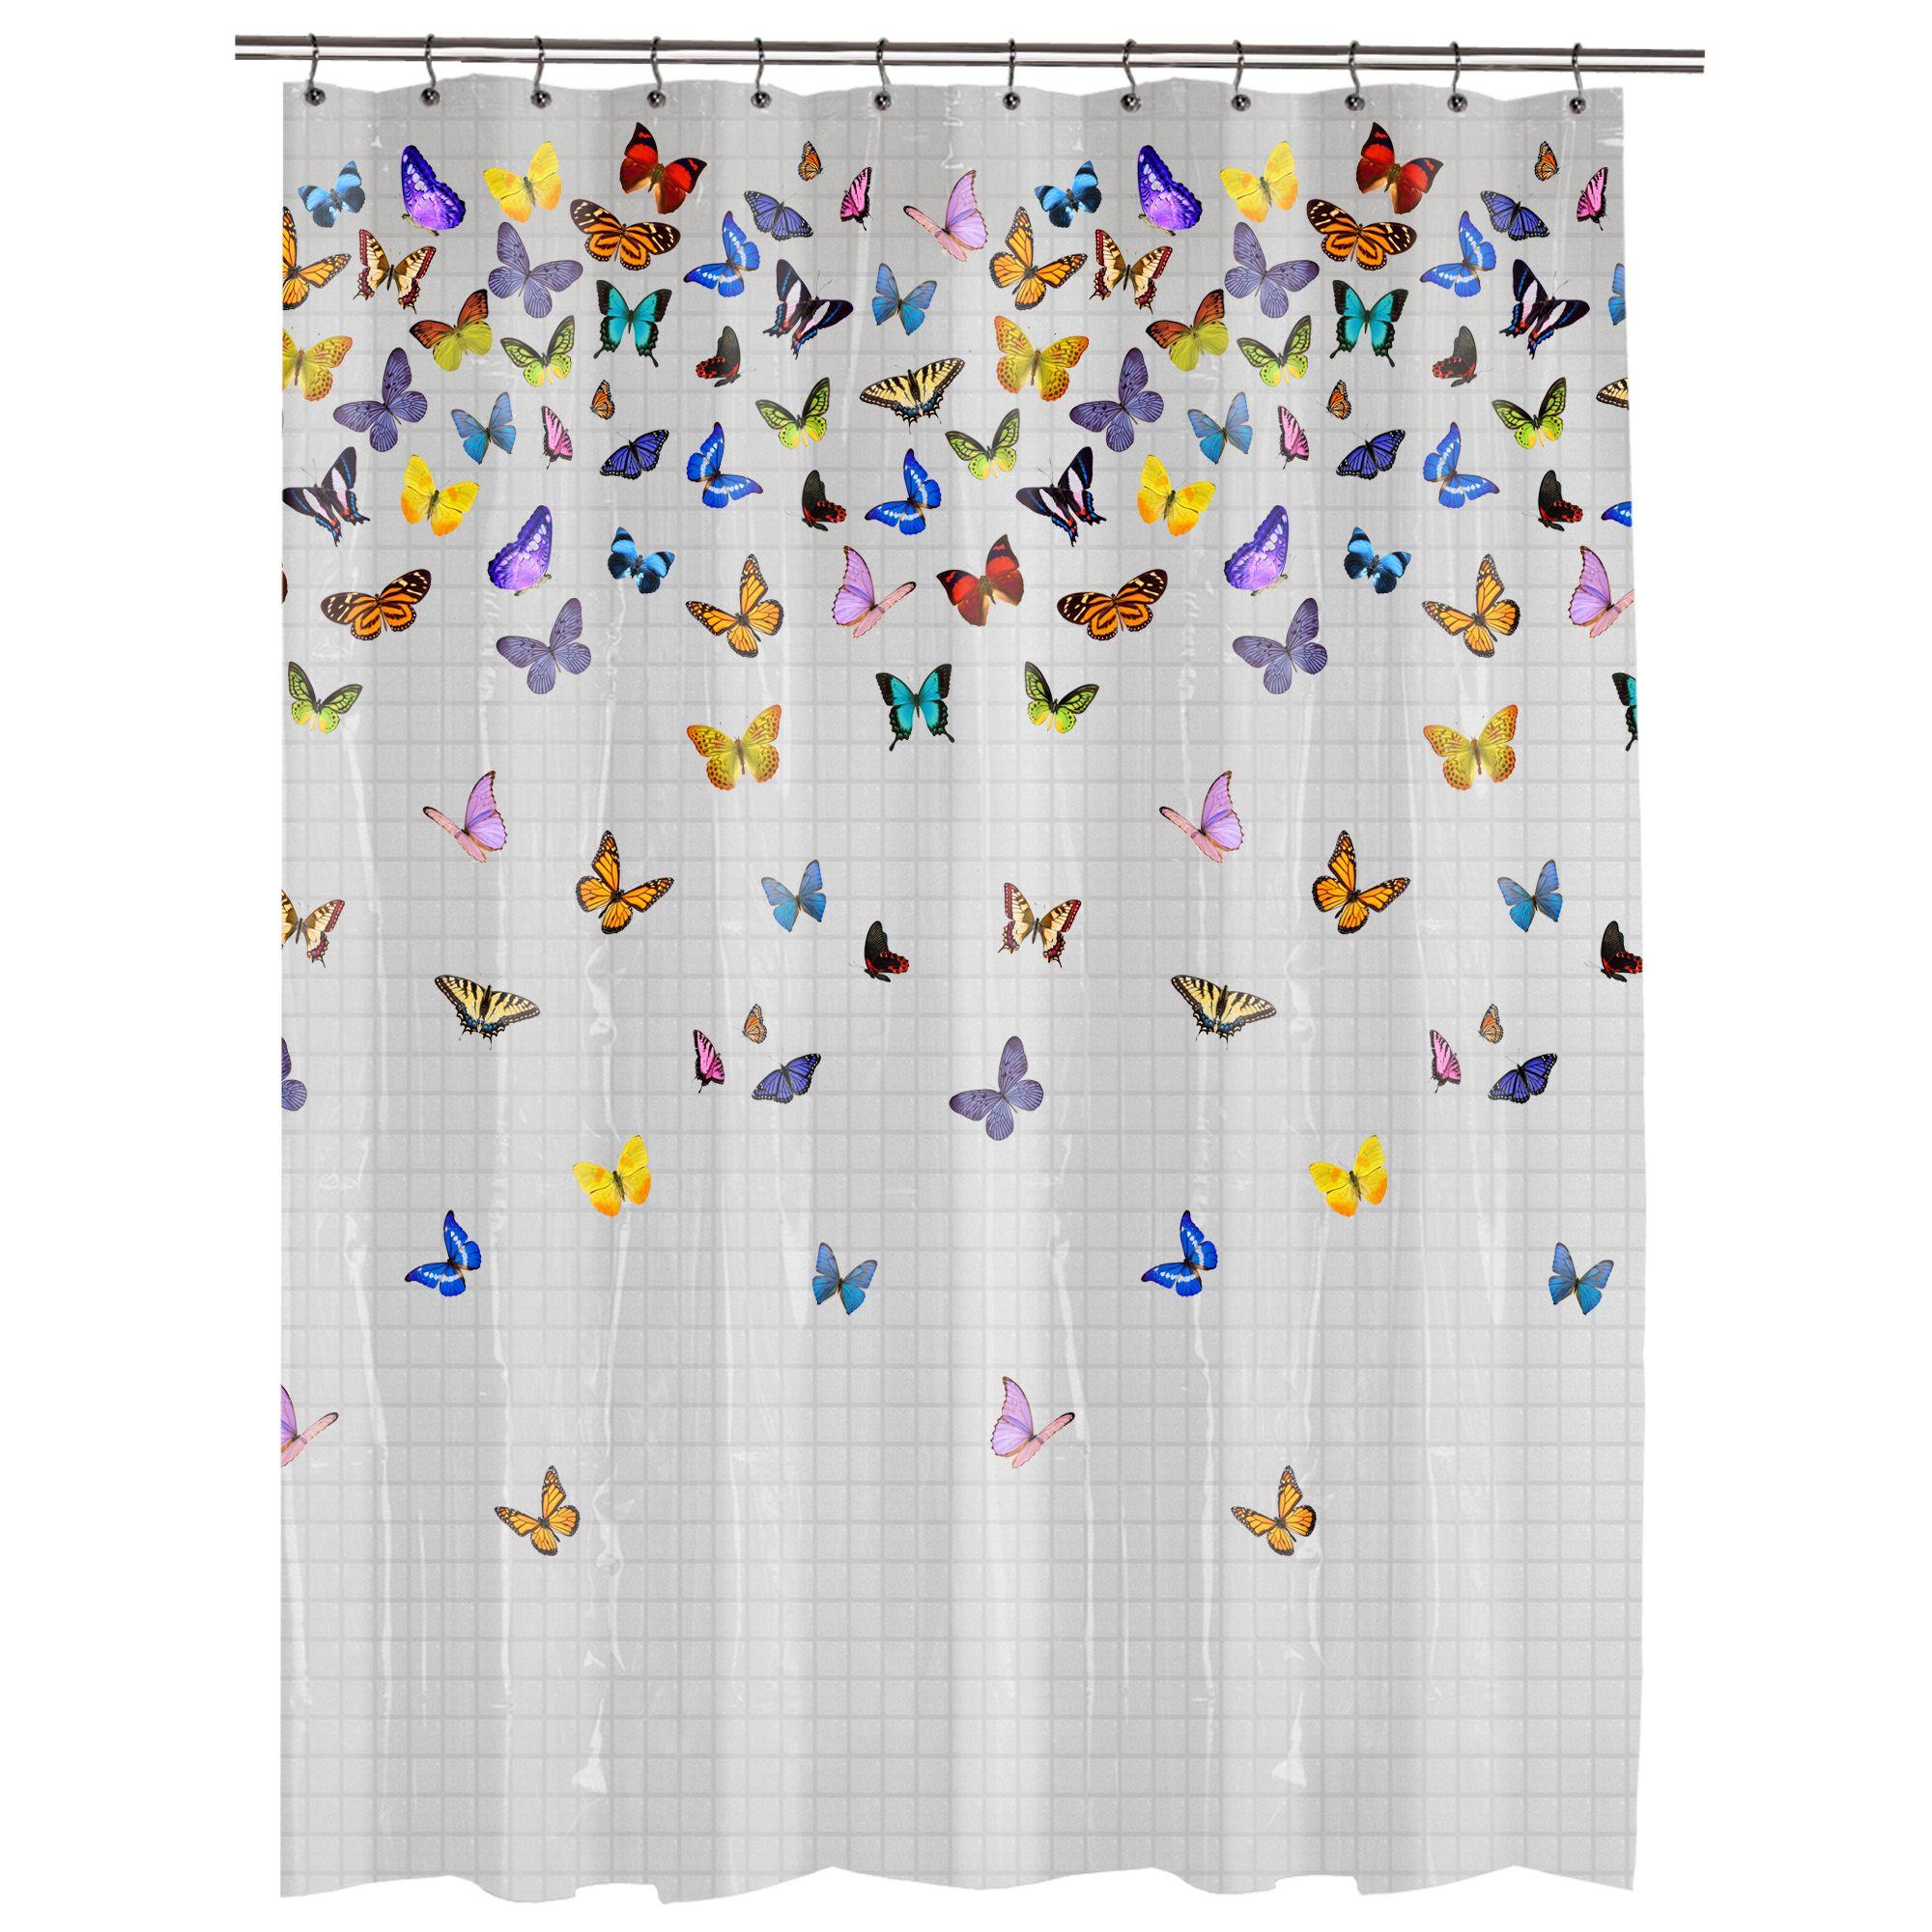 Butterfly Shower Curtain Walmart | Share